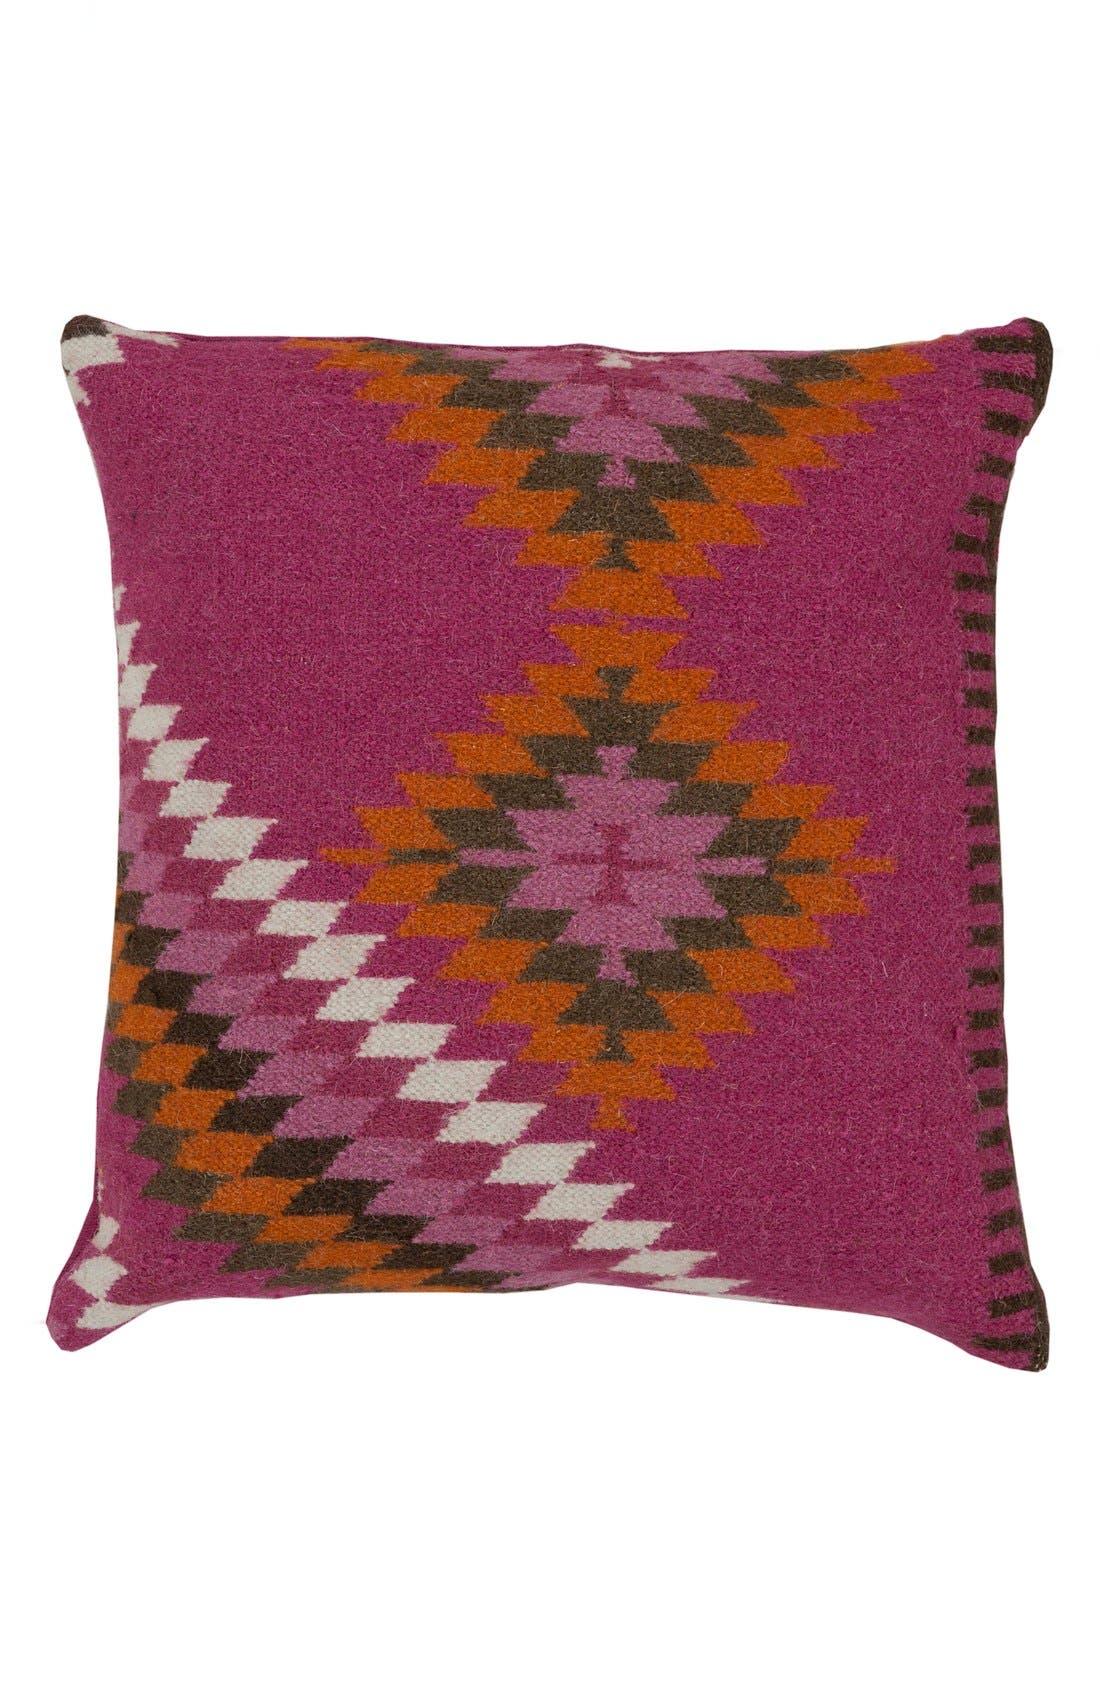 Kilim Wool Accent Pillow Cover,                         Main,                         color, Magenta/ Beige/ Burnt Orange